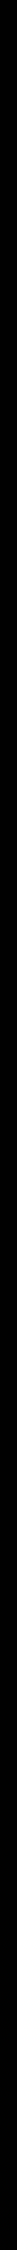 black copy 6.jpg